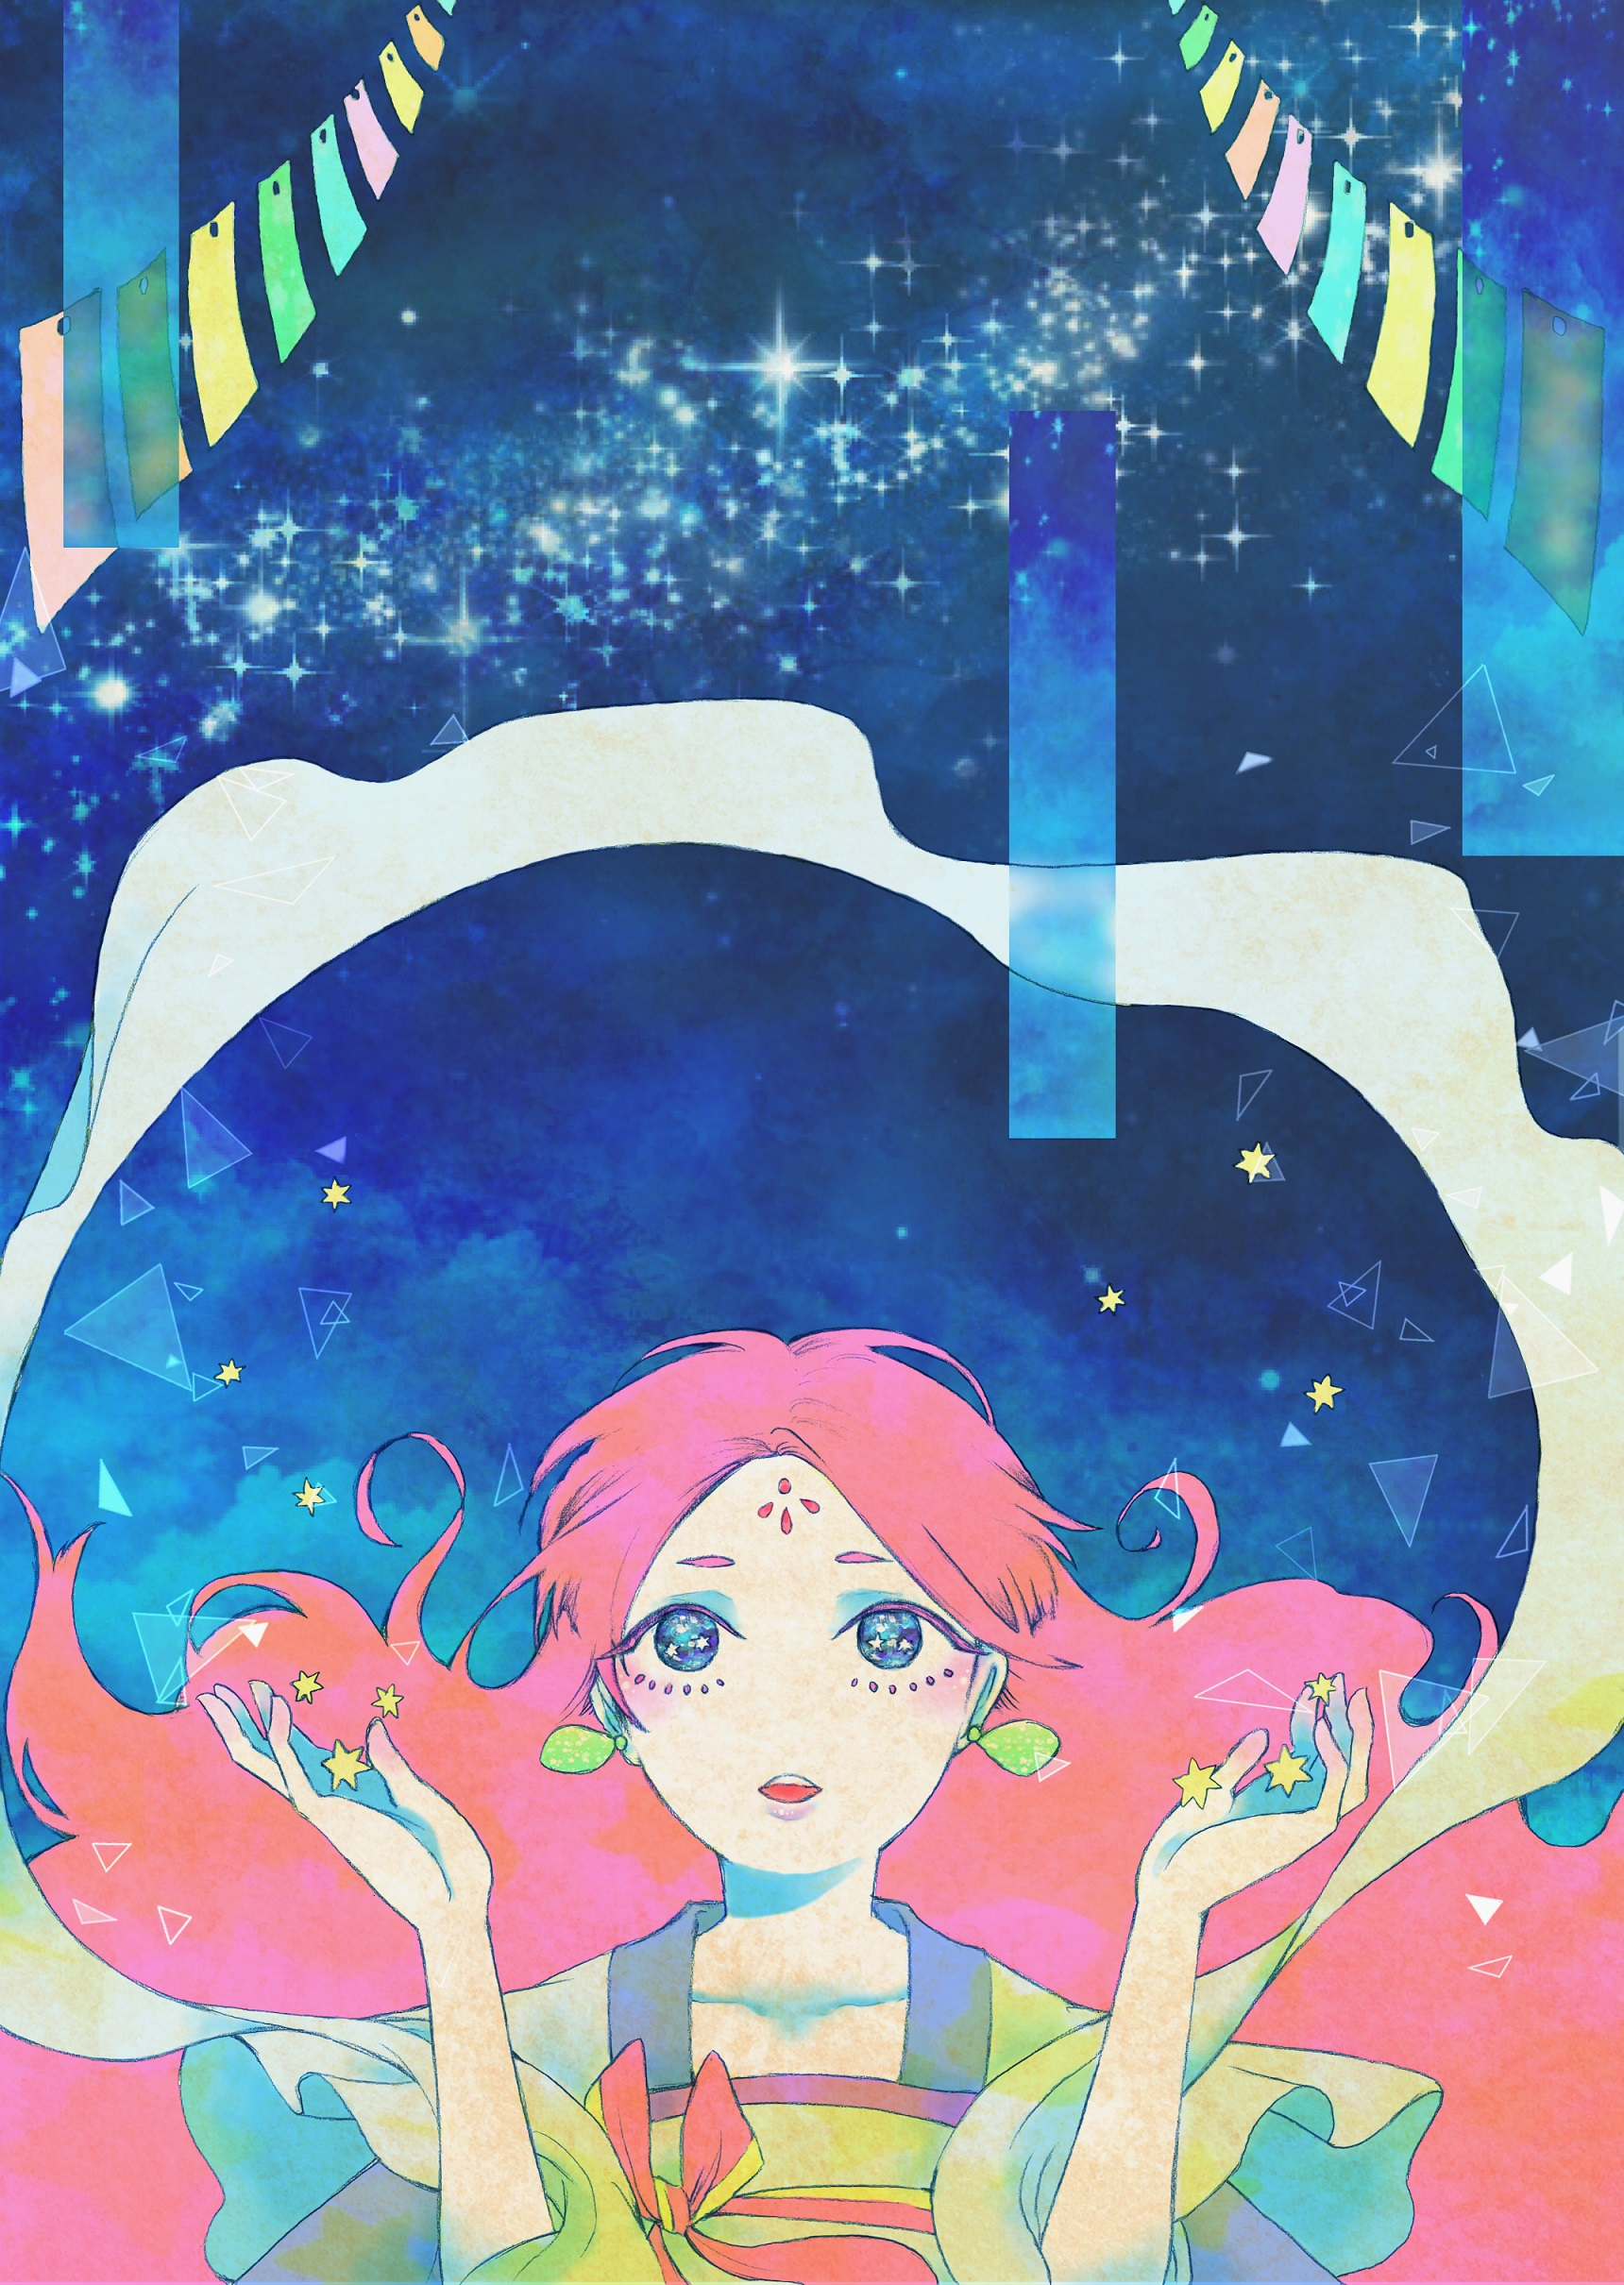 #8「一夕ノ夢」